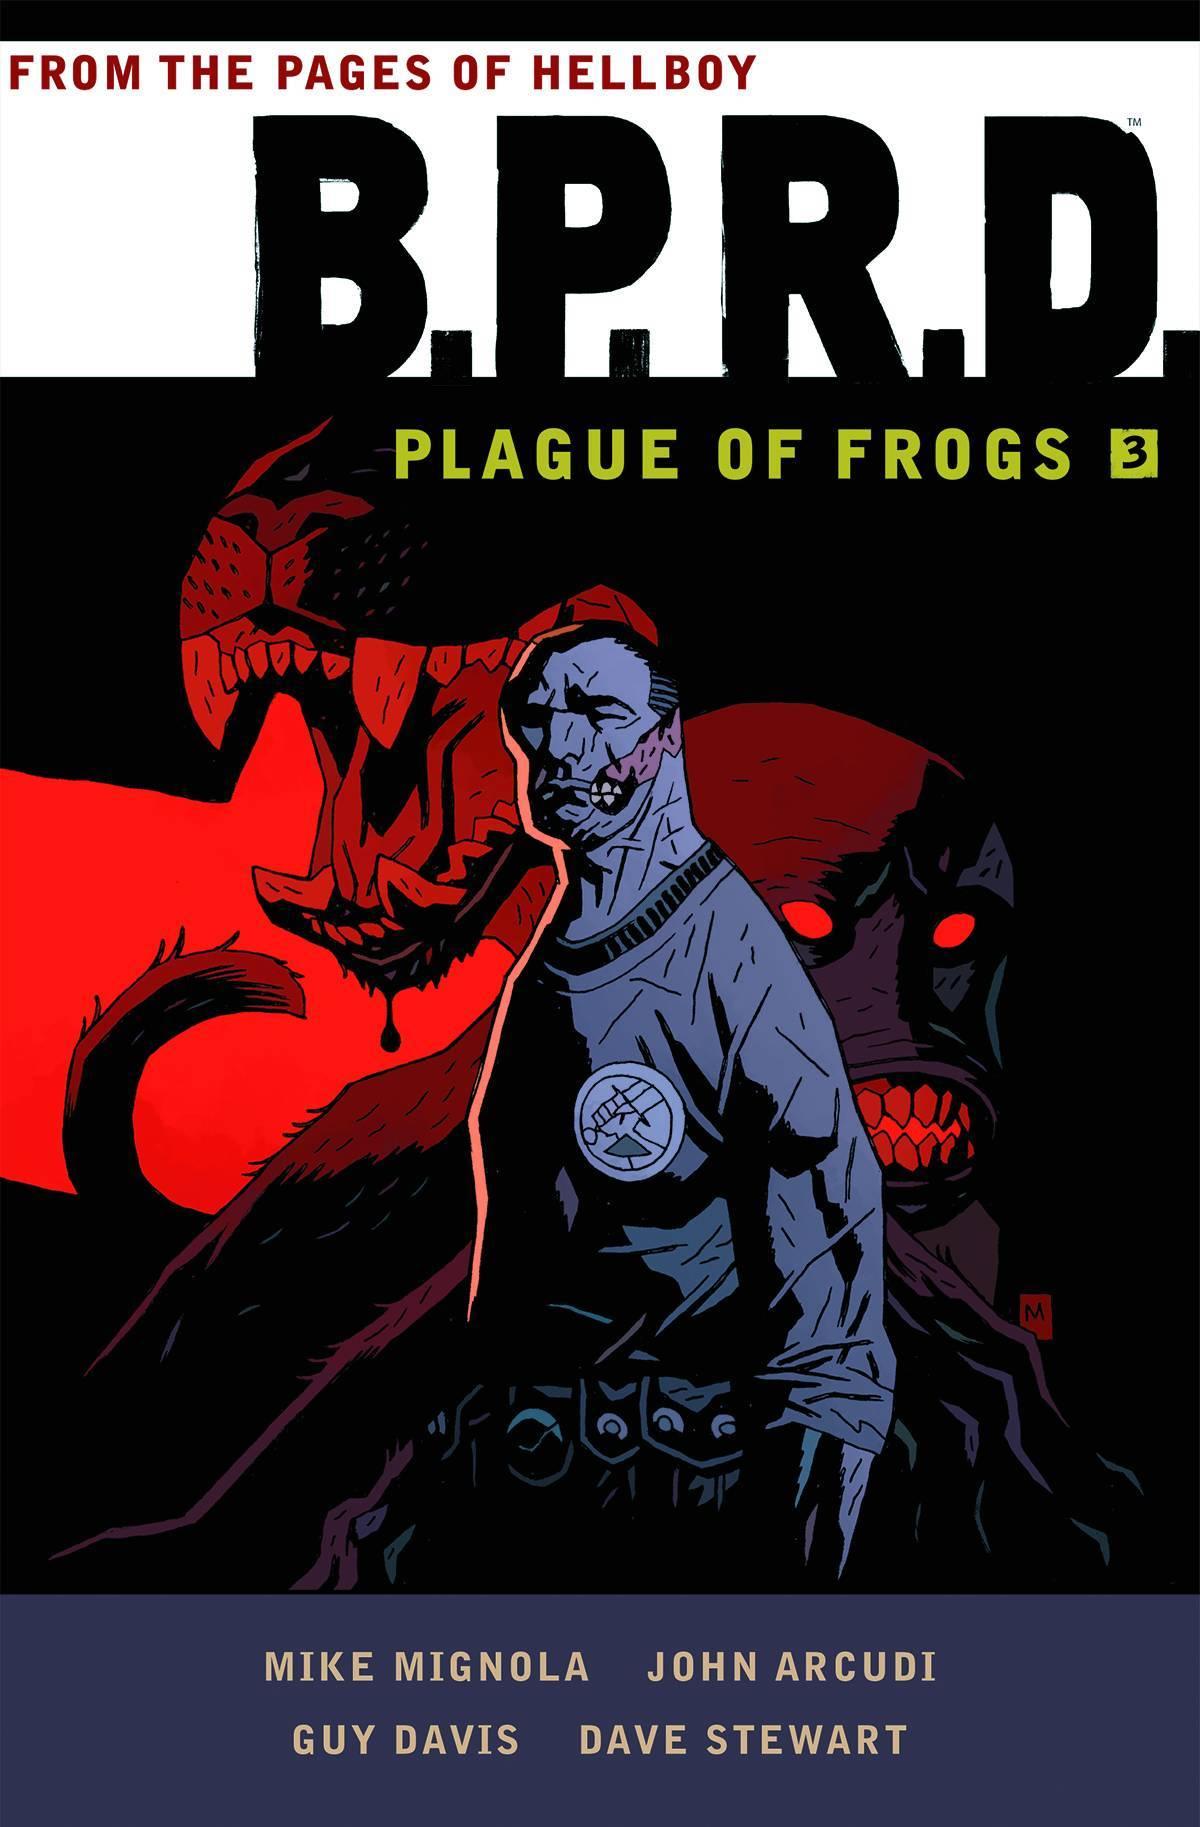 BPRD Plague of Frogs Vol 03